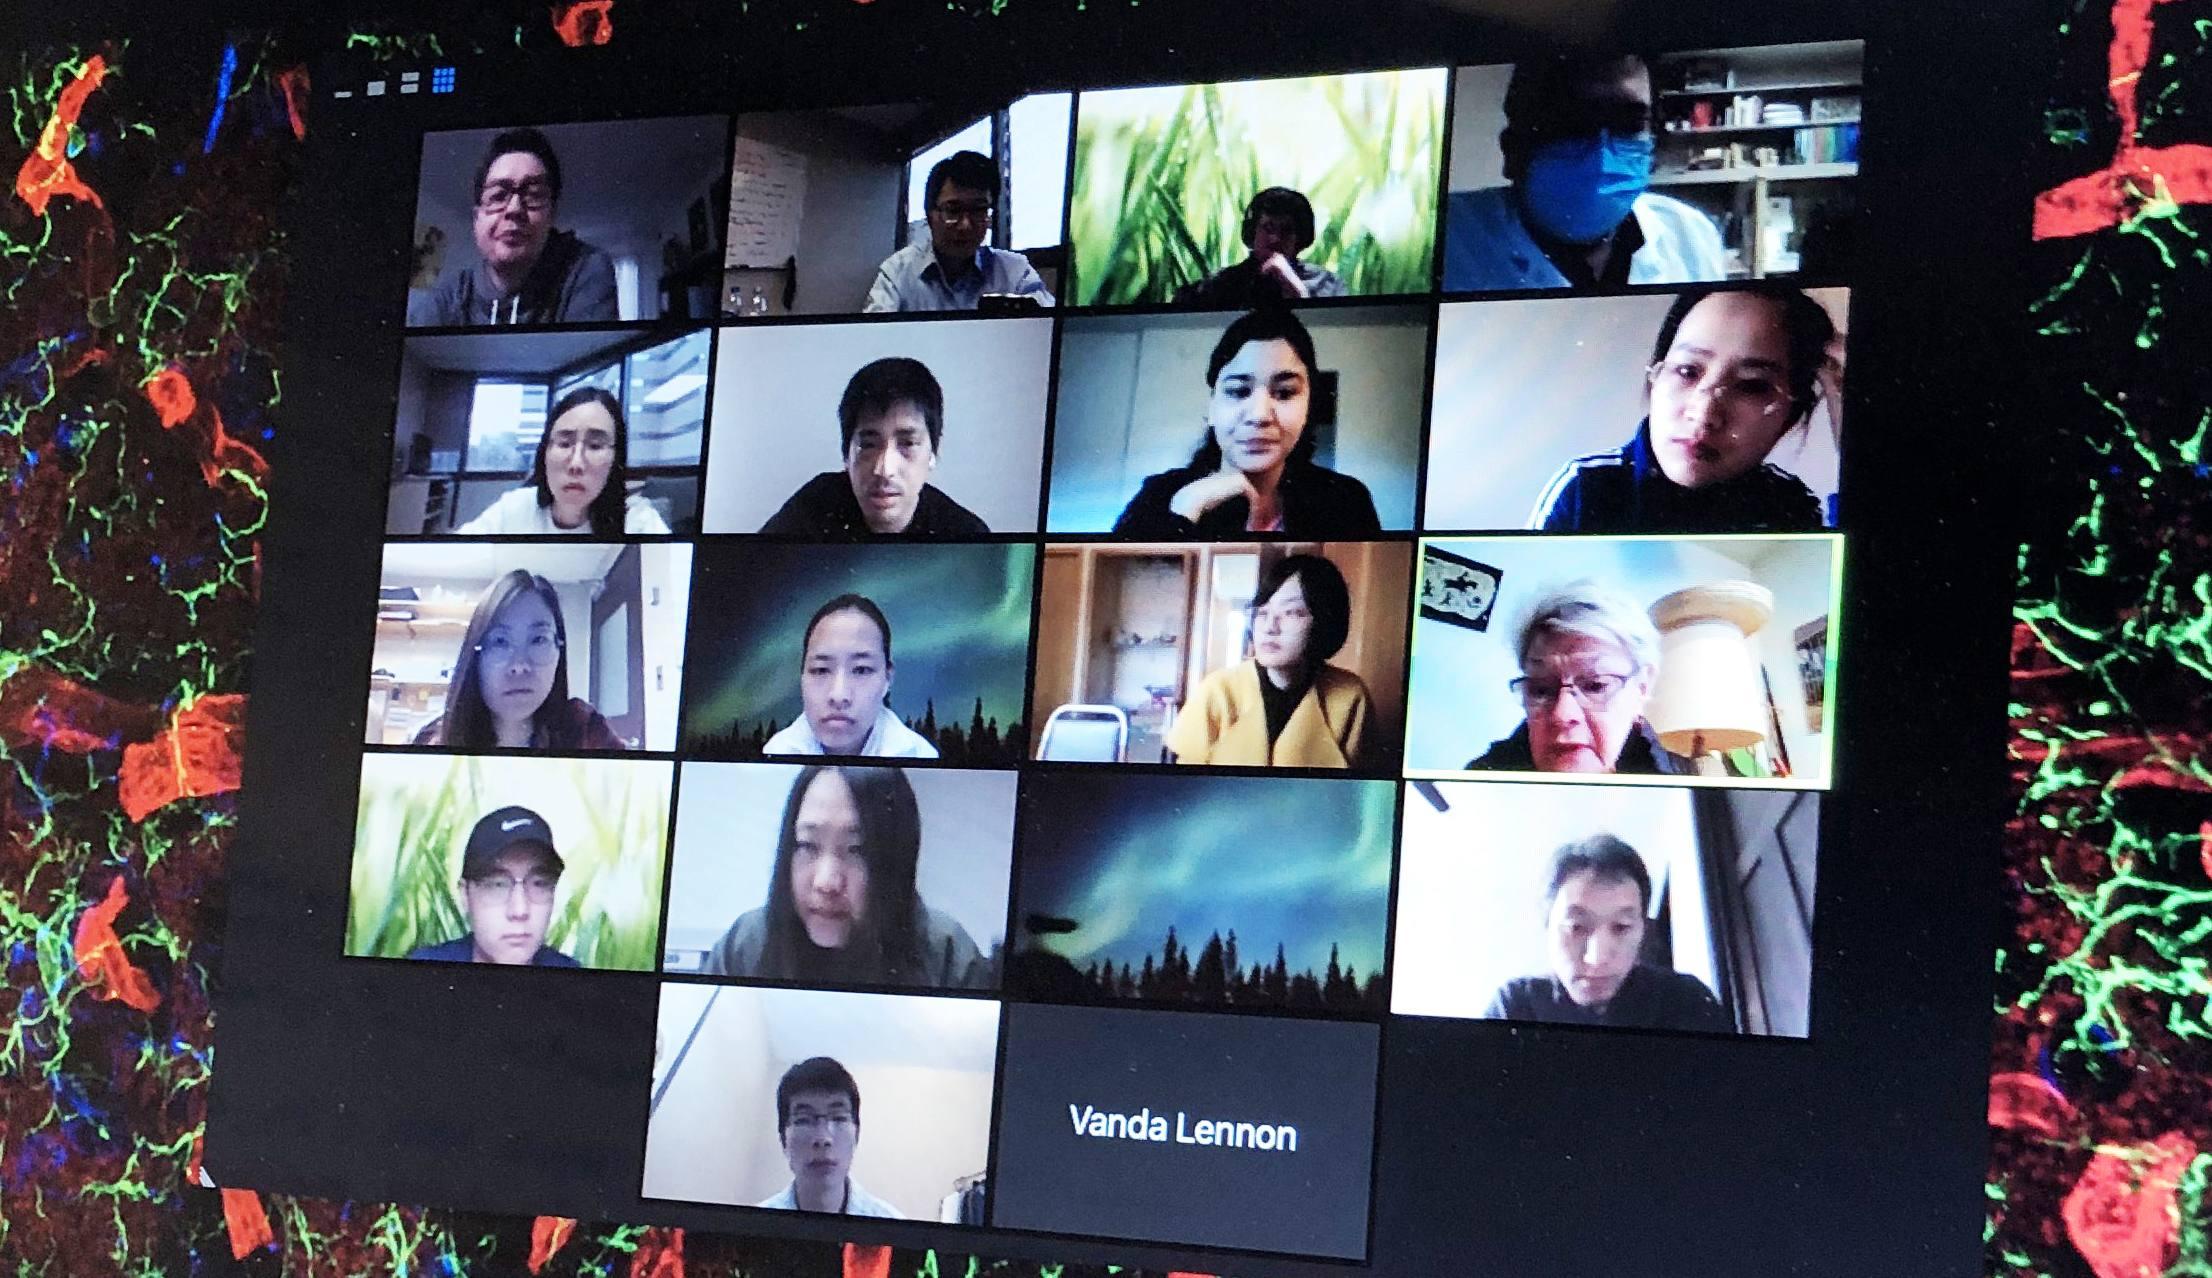 Wu lab zoom meeting Apr 28, 2020